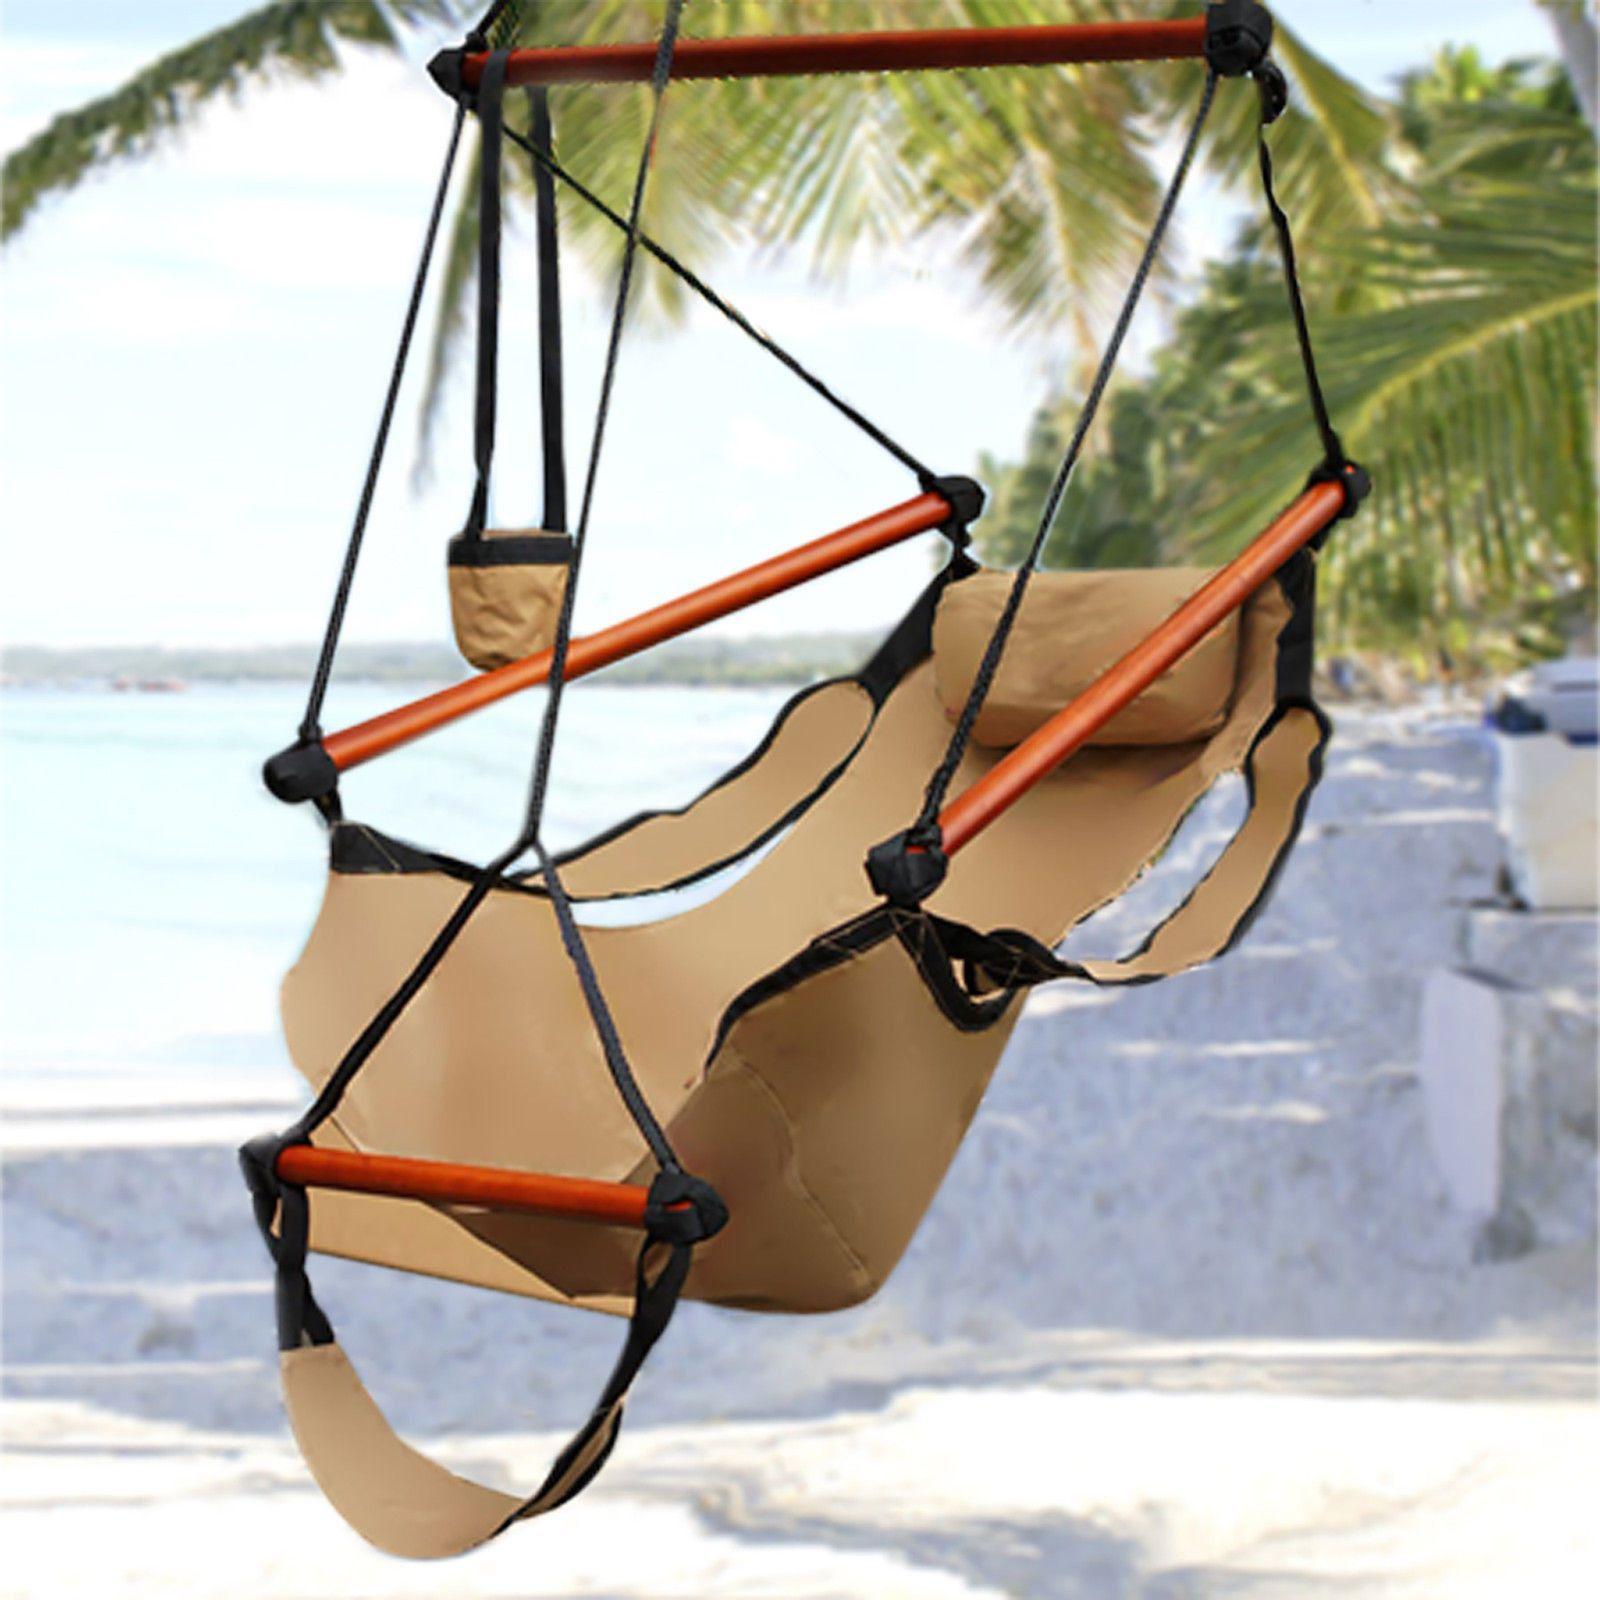 Adjustable hanging hammock chair in sand in كراسي pinterest